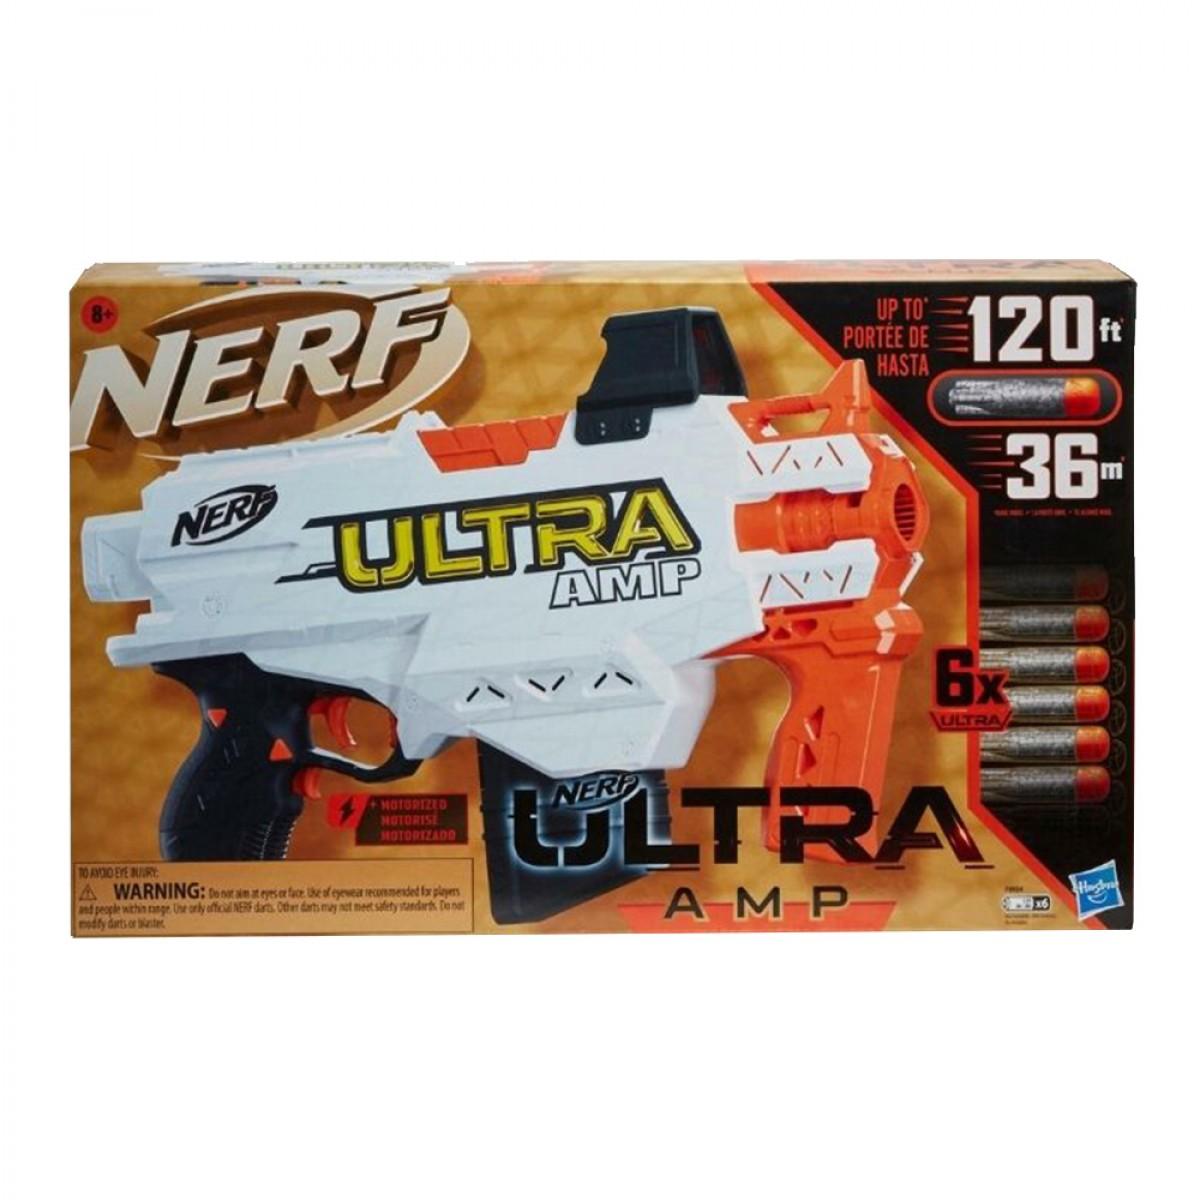 NERF ULTRA AMP  F0954